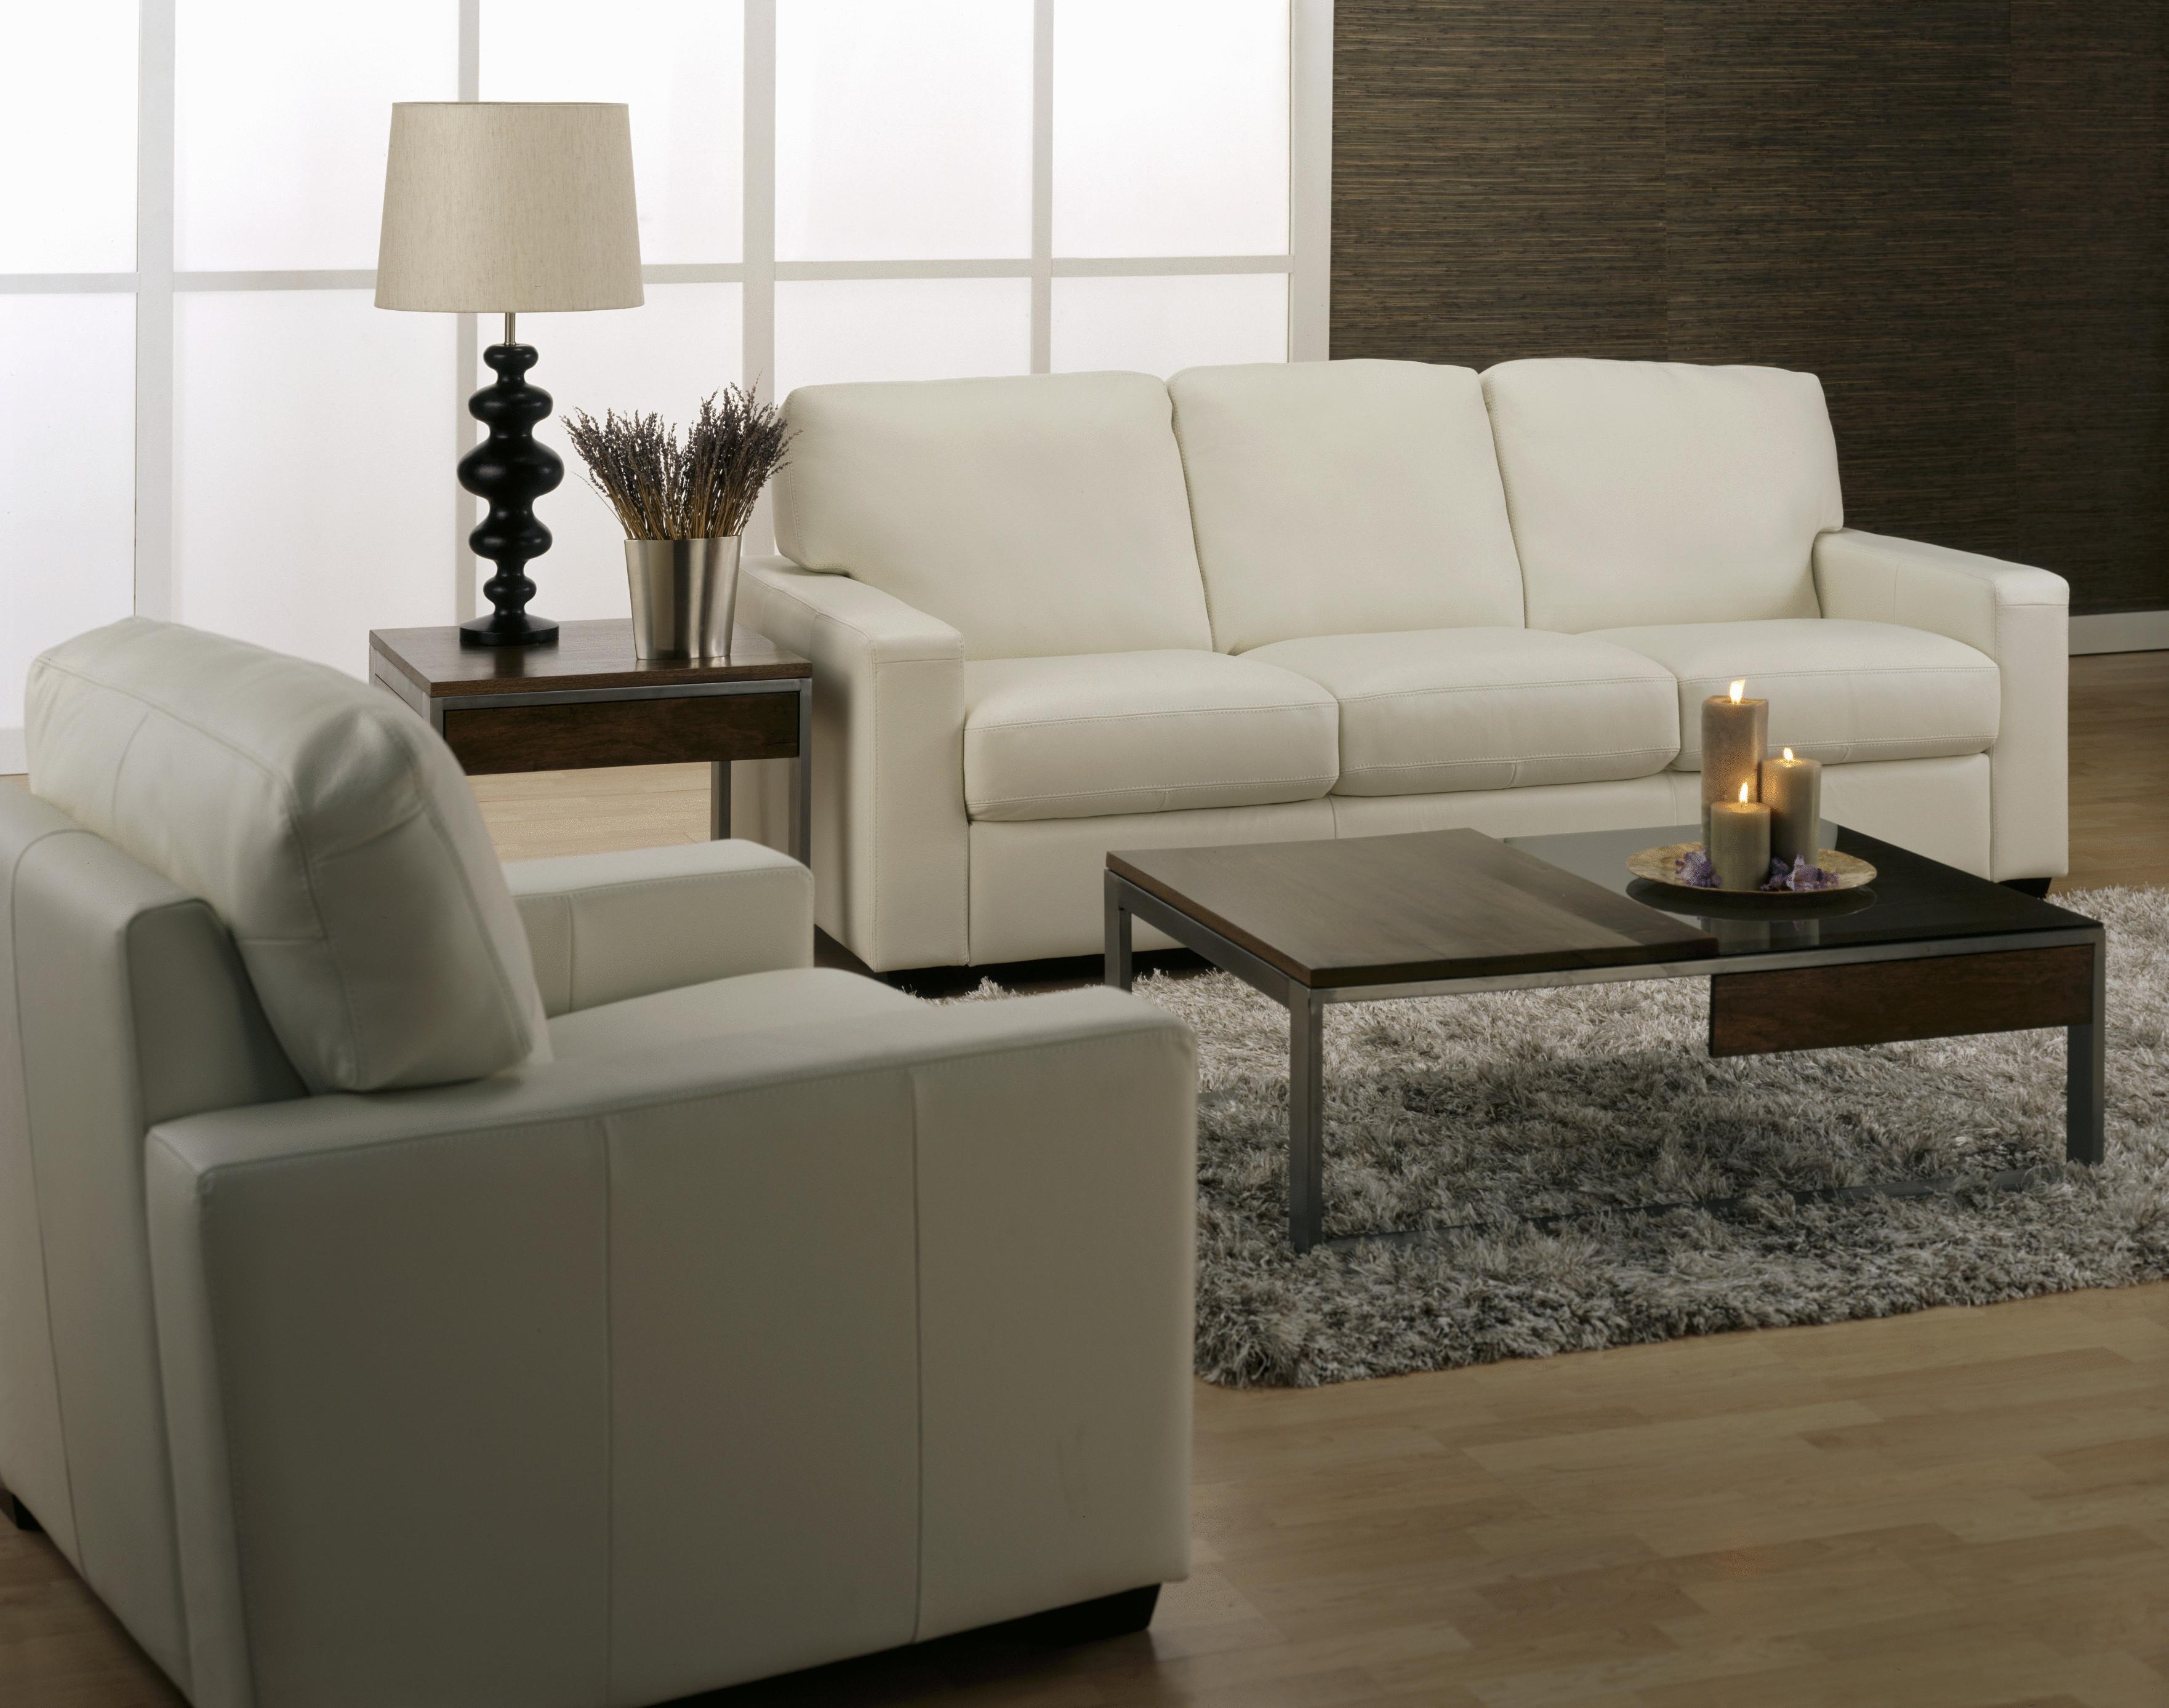 palliser stationary sofas harga sofa bed inoac tangerang westend living room group dunk